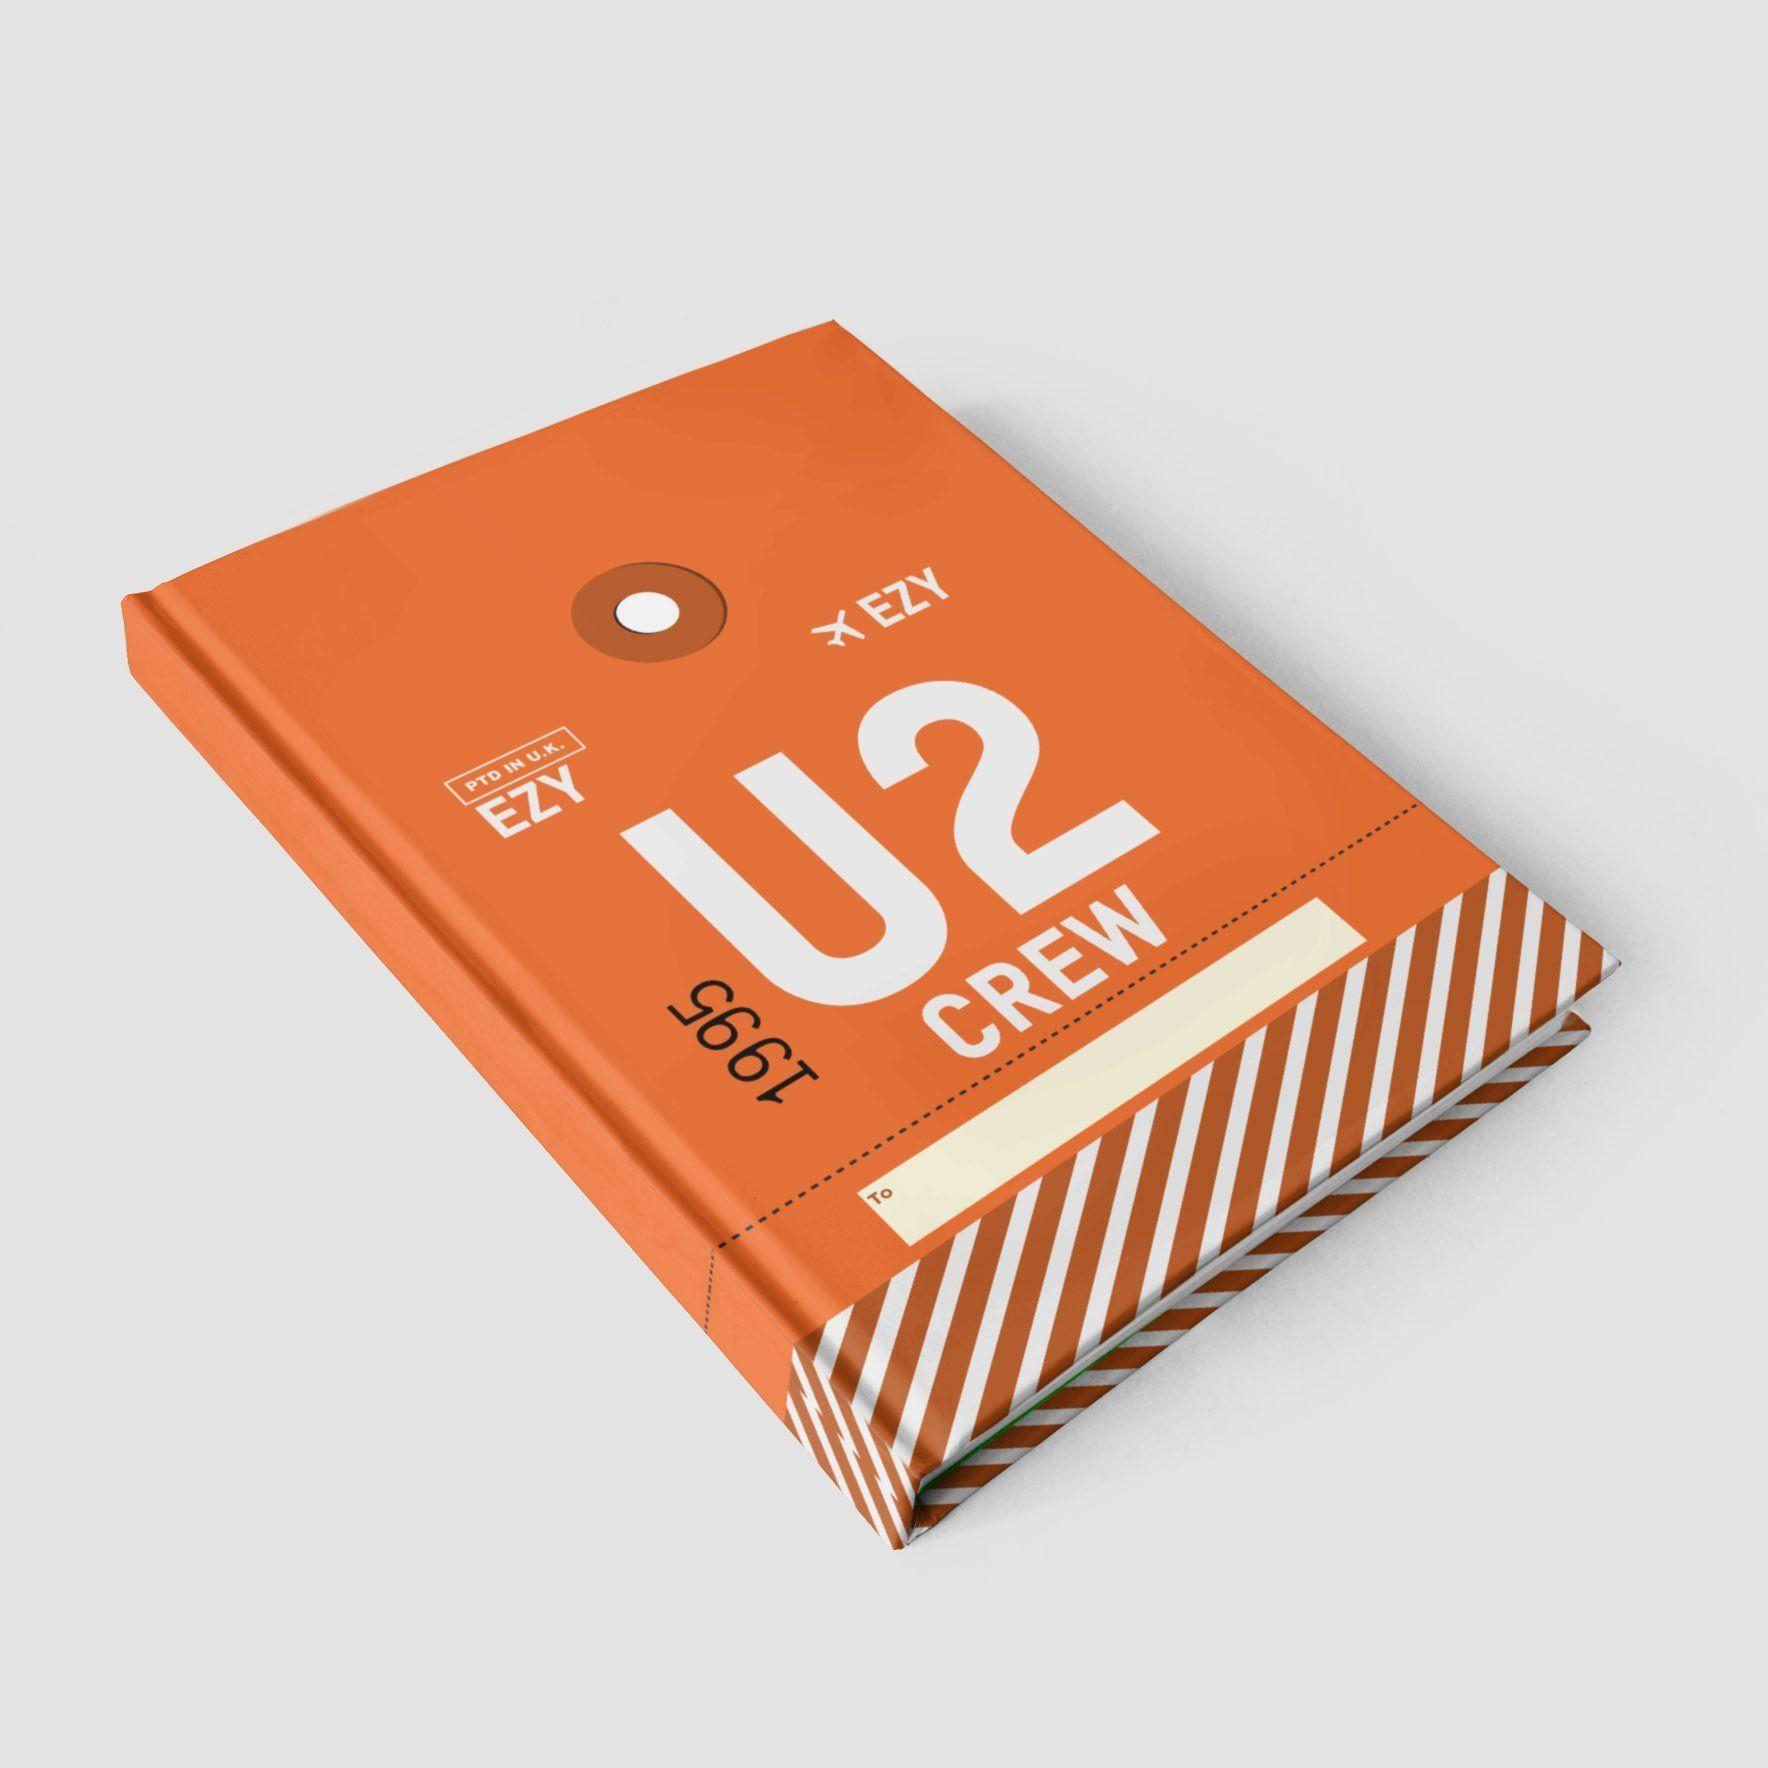 U2 - Journal